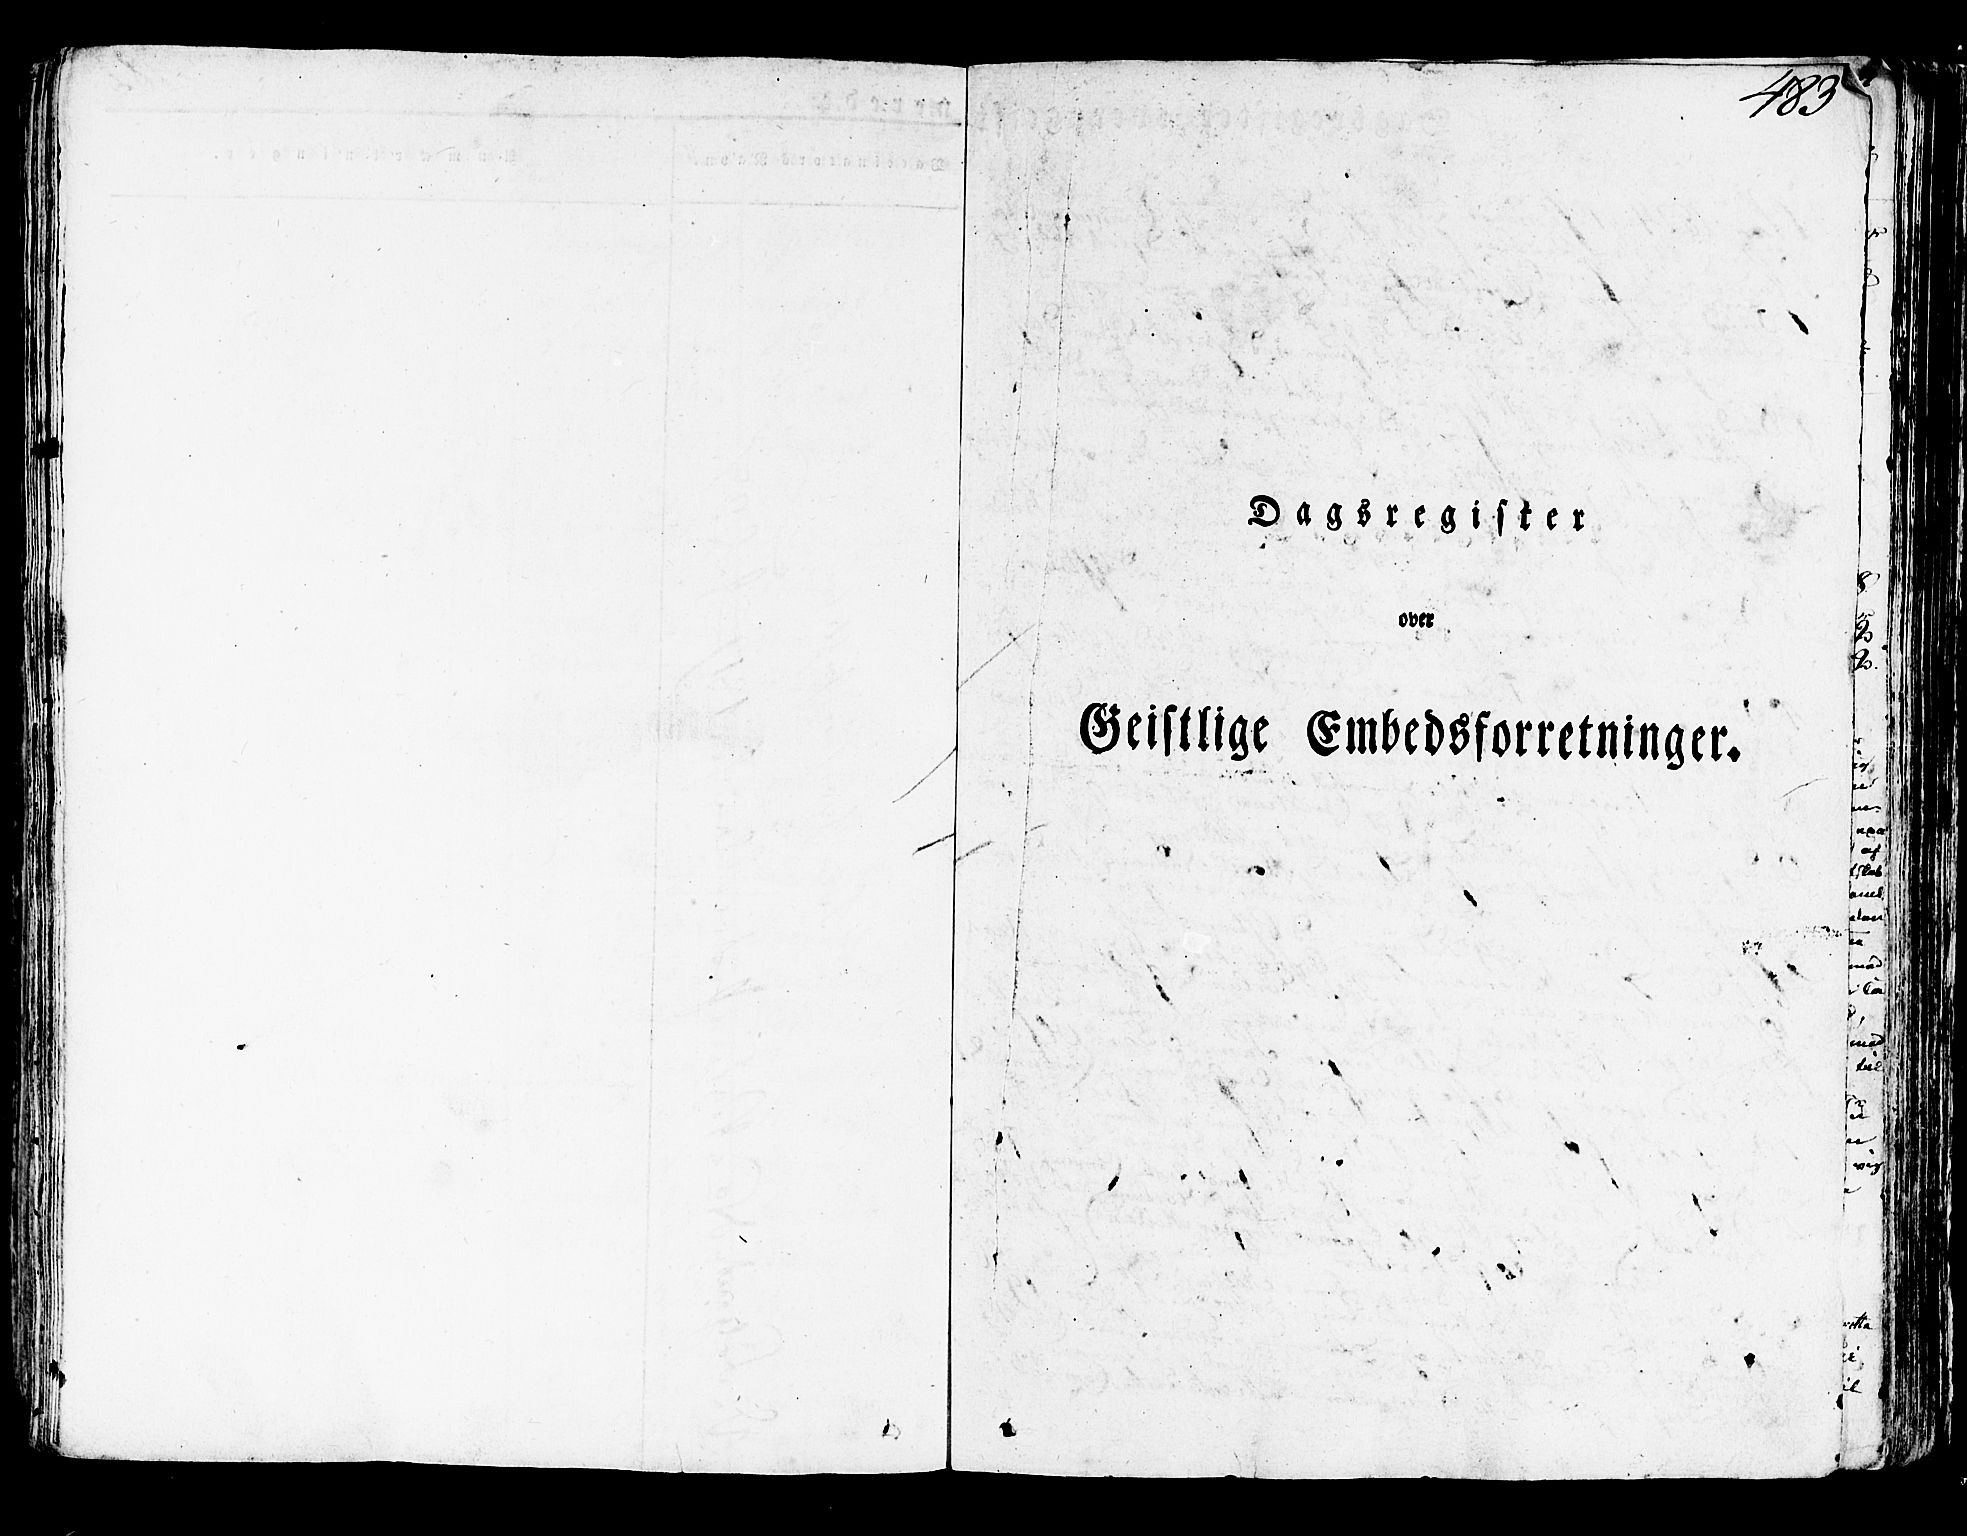 SAB, Lindås Sokneprestembete, H/Haa: Ministerialbok nr. A 8, 1823-1836, s. 483